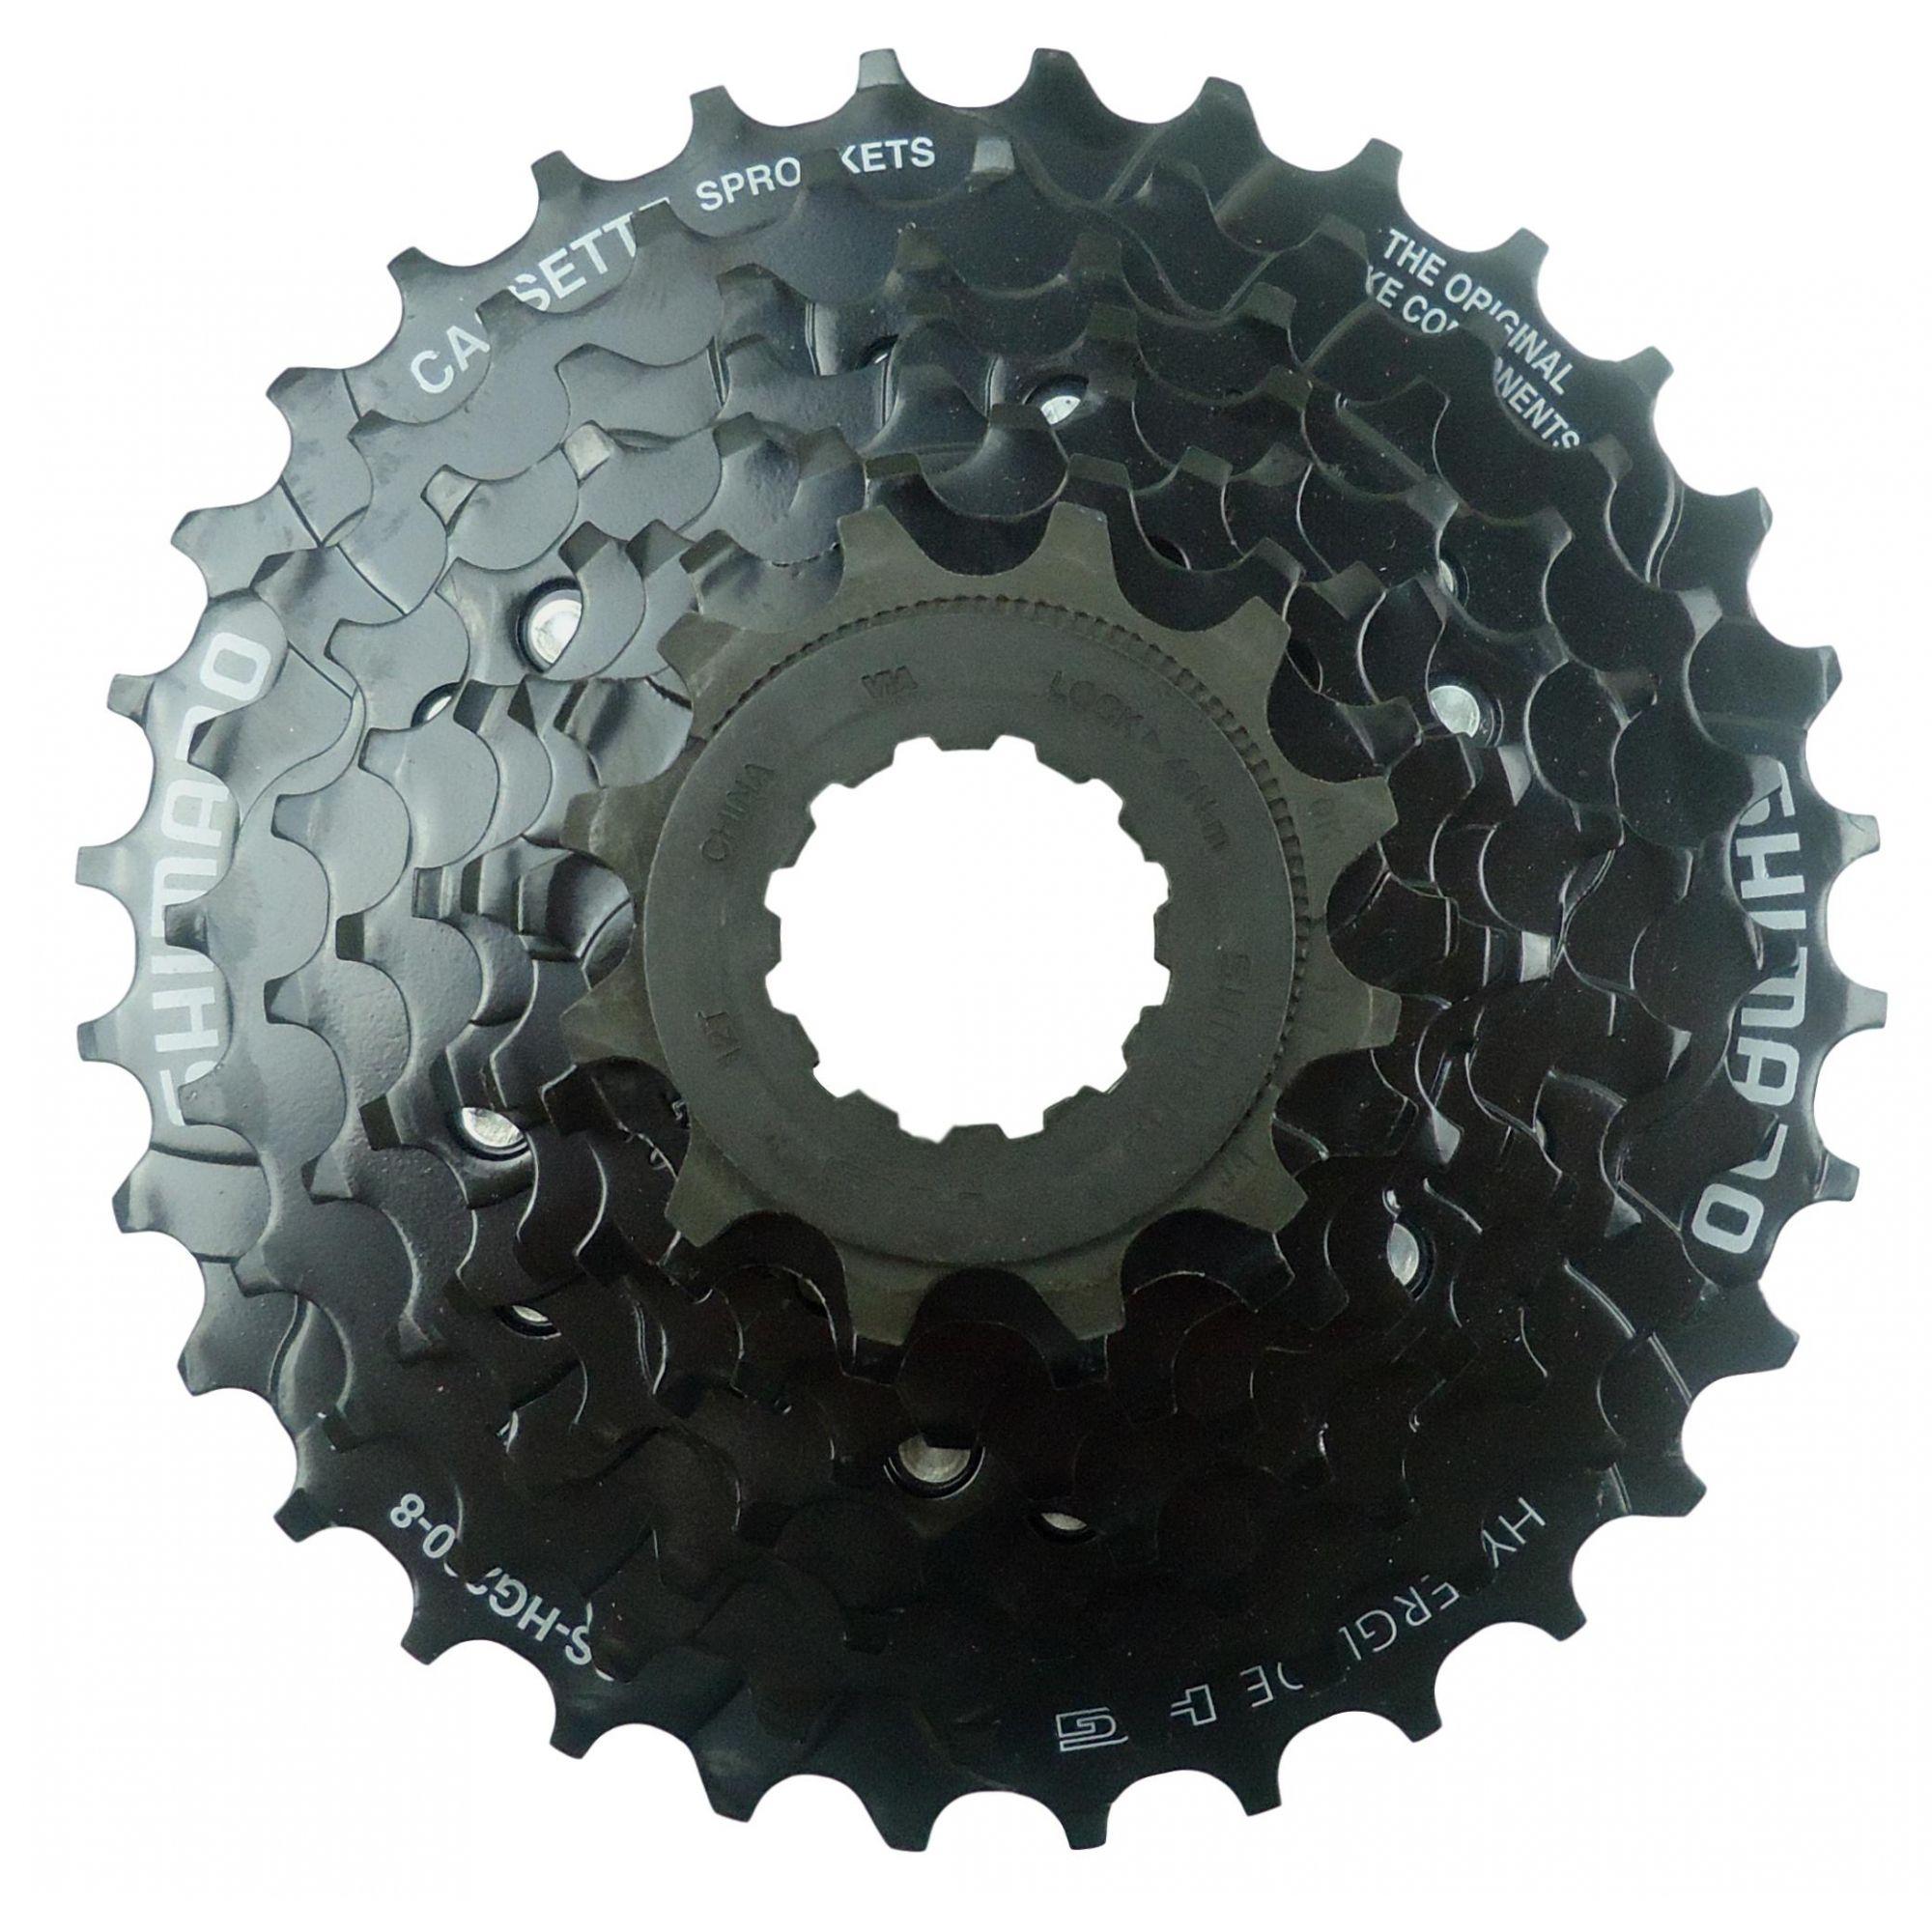 Cassete Bicicleta Shimano Altus Hg200-8 12-32 8 Velocidades cor Preto MTb ou Speed